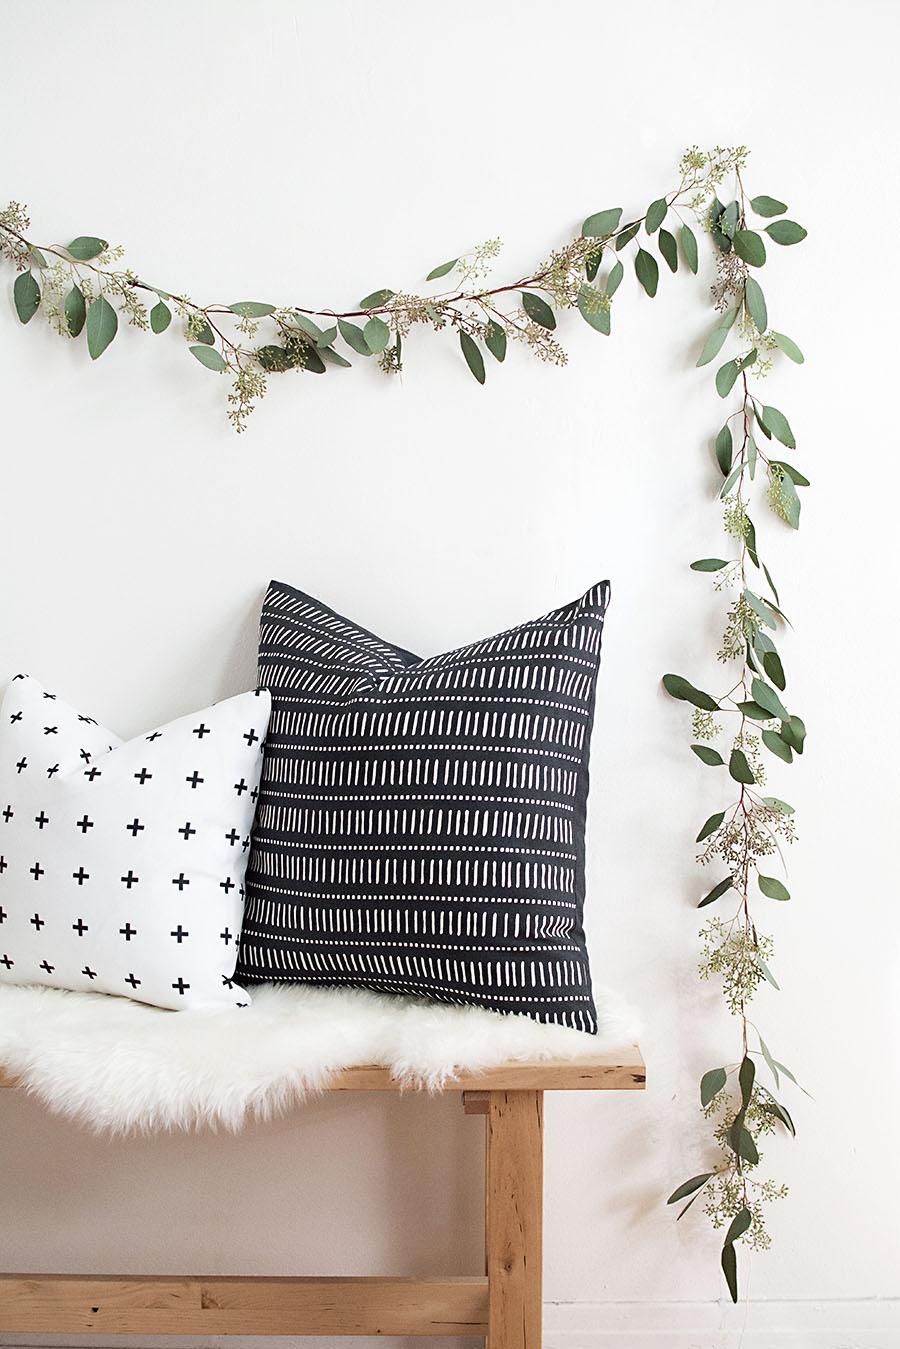 DIY Eucalyptus Garland from Homey Oh My